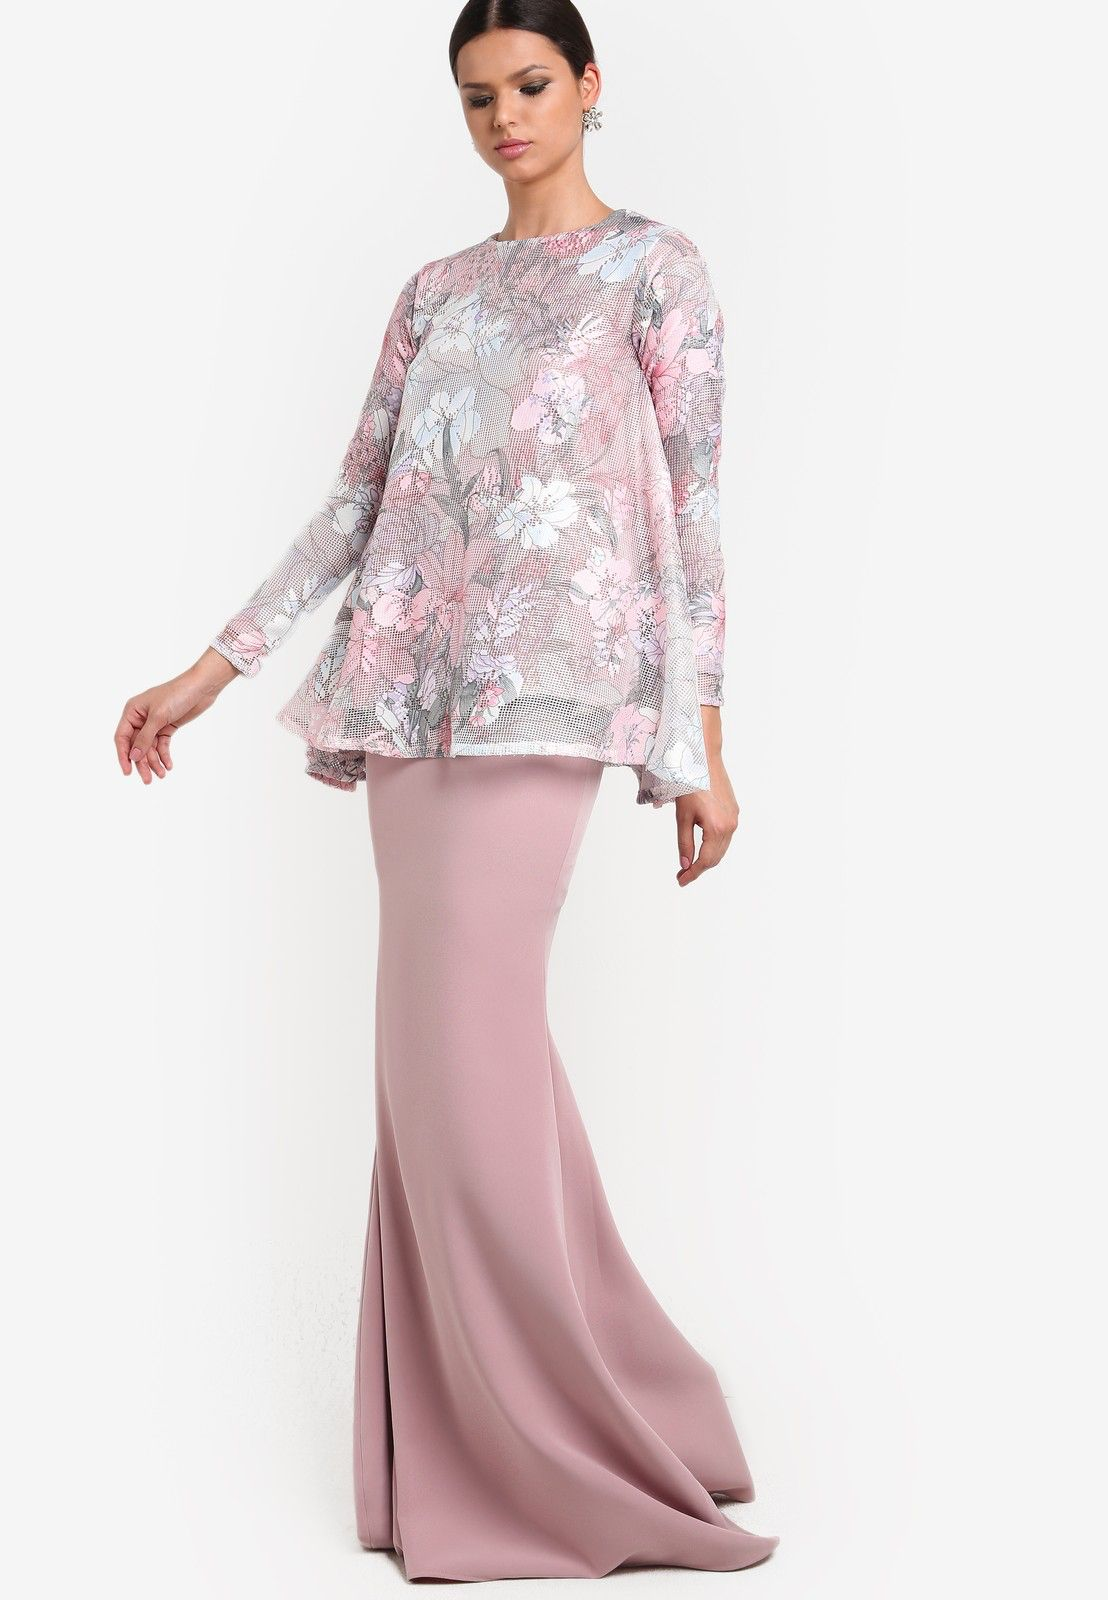 Wanpa Teratai Kurung Kebaya Baju Kurung In 2019 Fashion